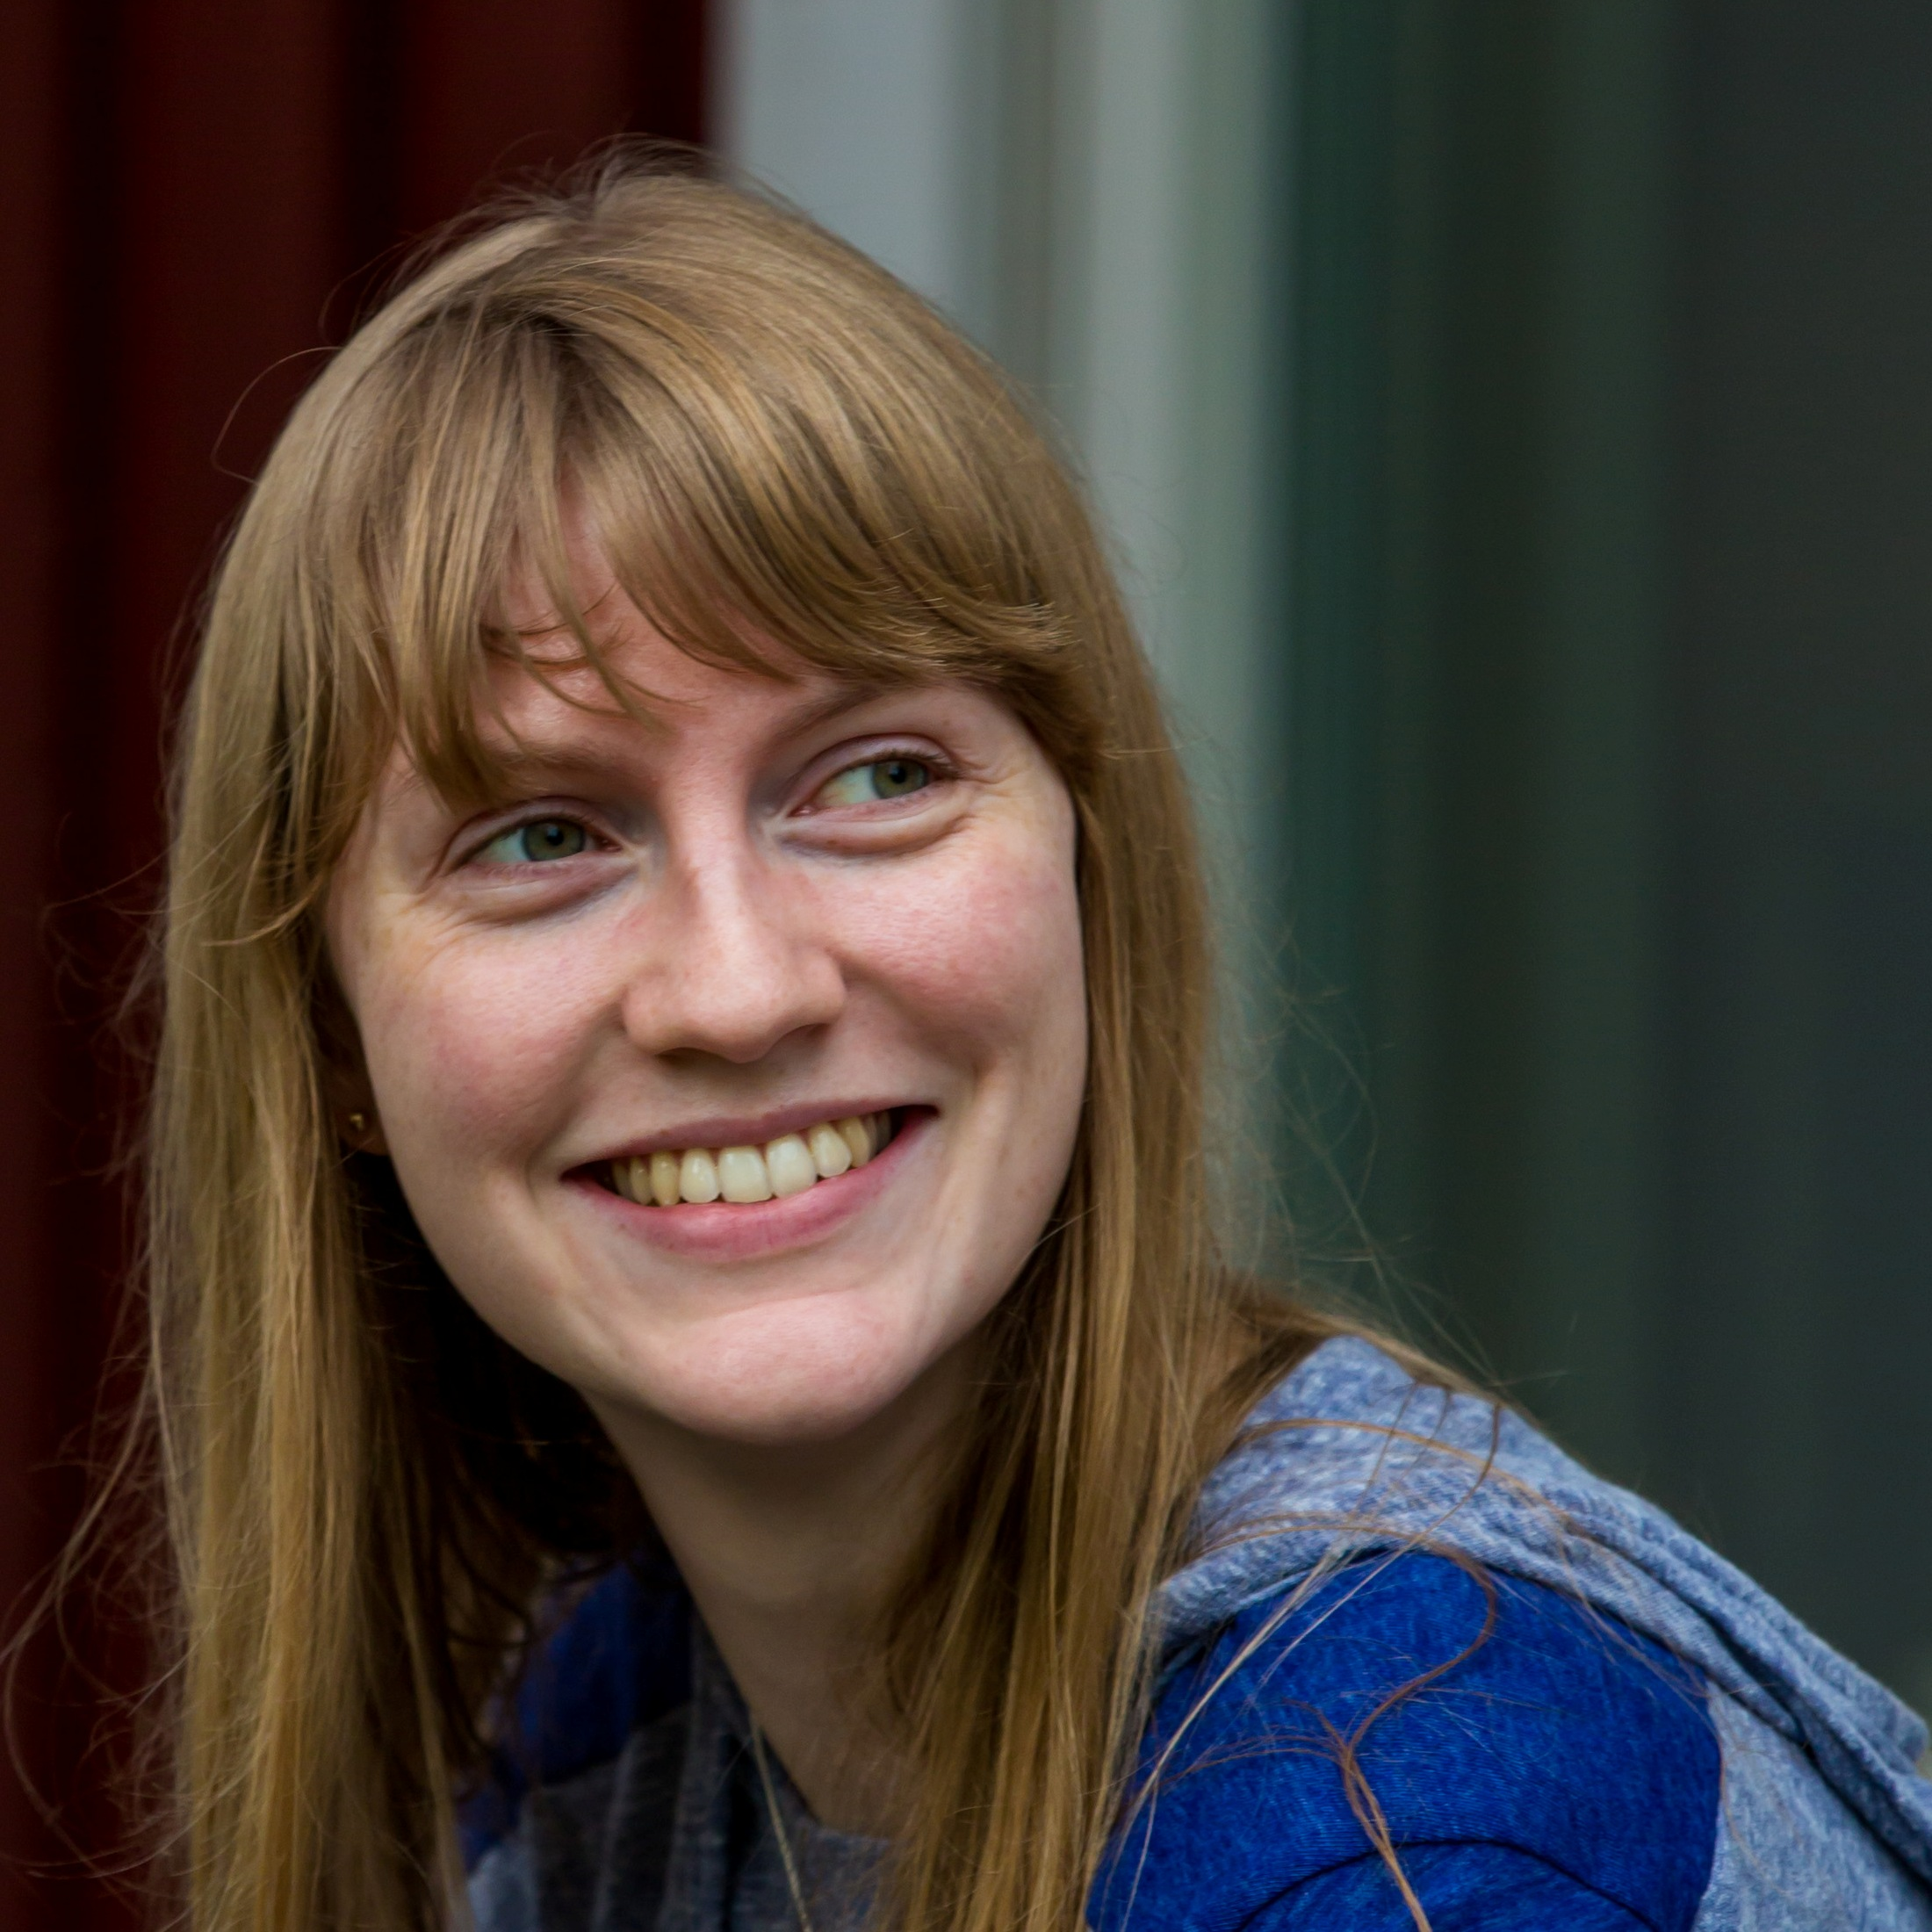 Heather McLaren